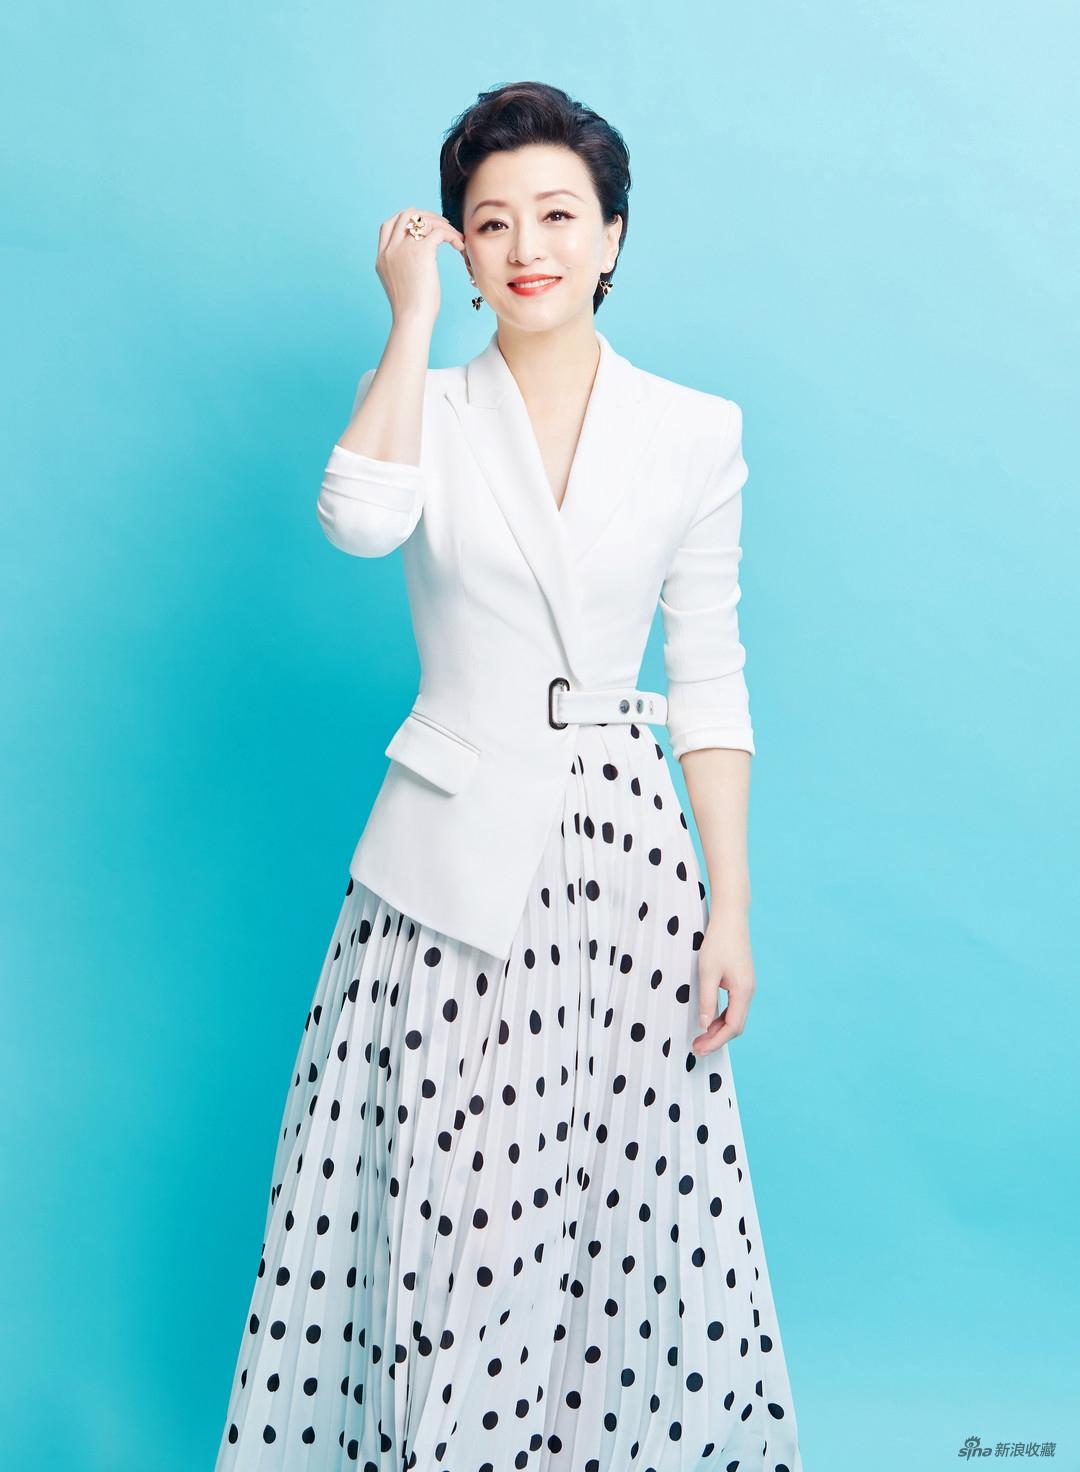 LAN珠宝创始人杨澜女士